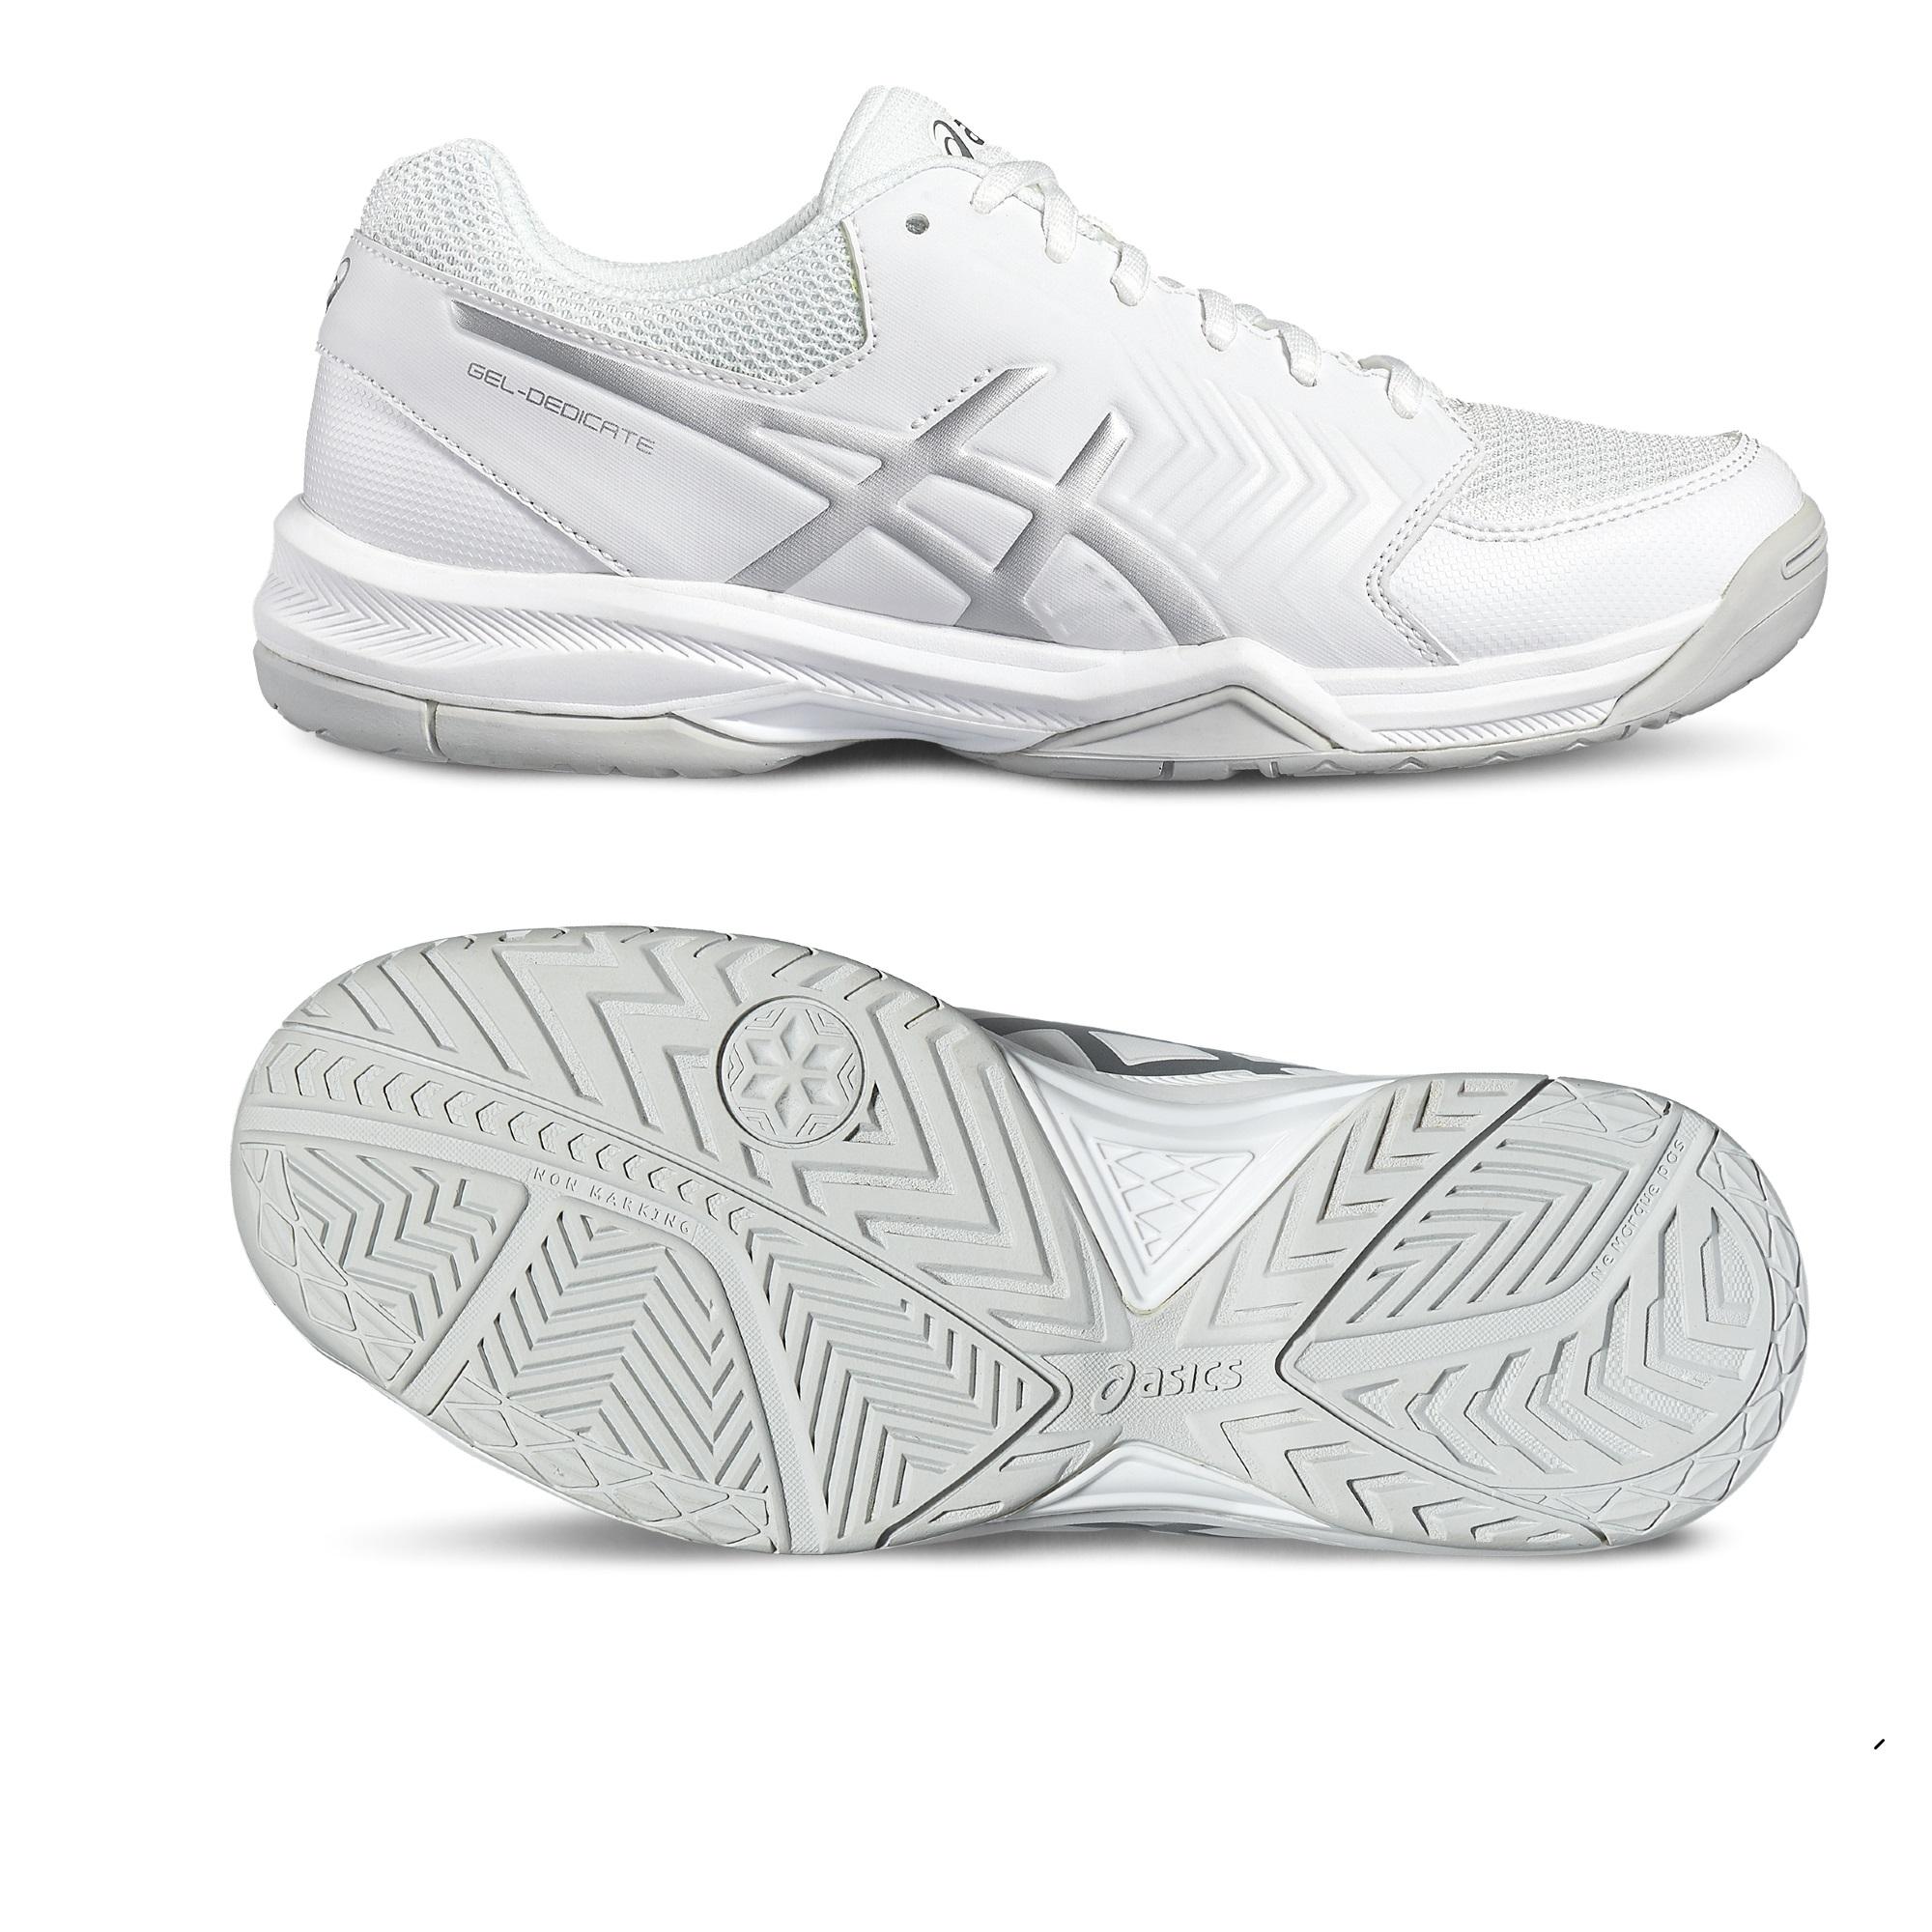 Asics GelDedicate 5 Ladies Tennis Shoes  WhiteSilver 5.5 UK